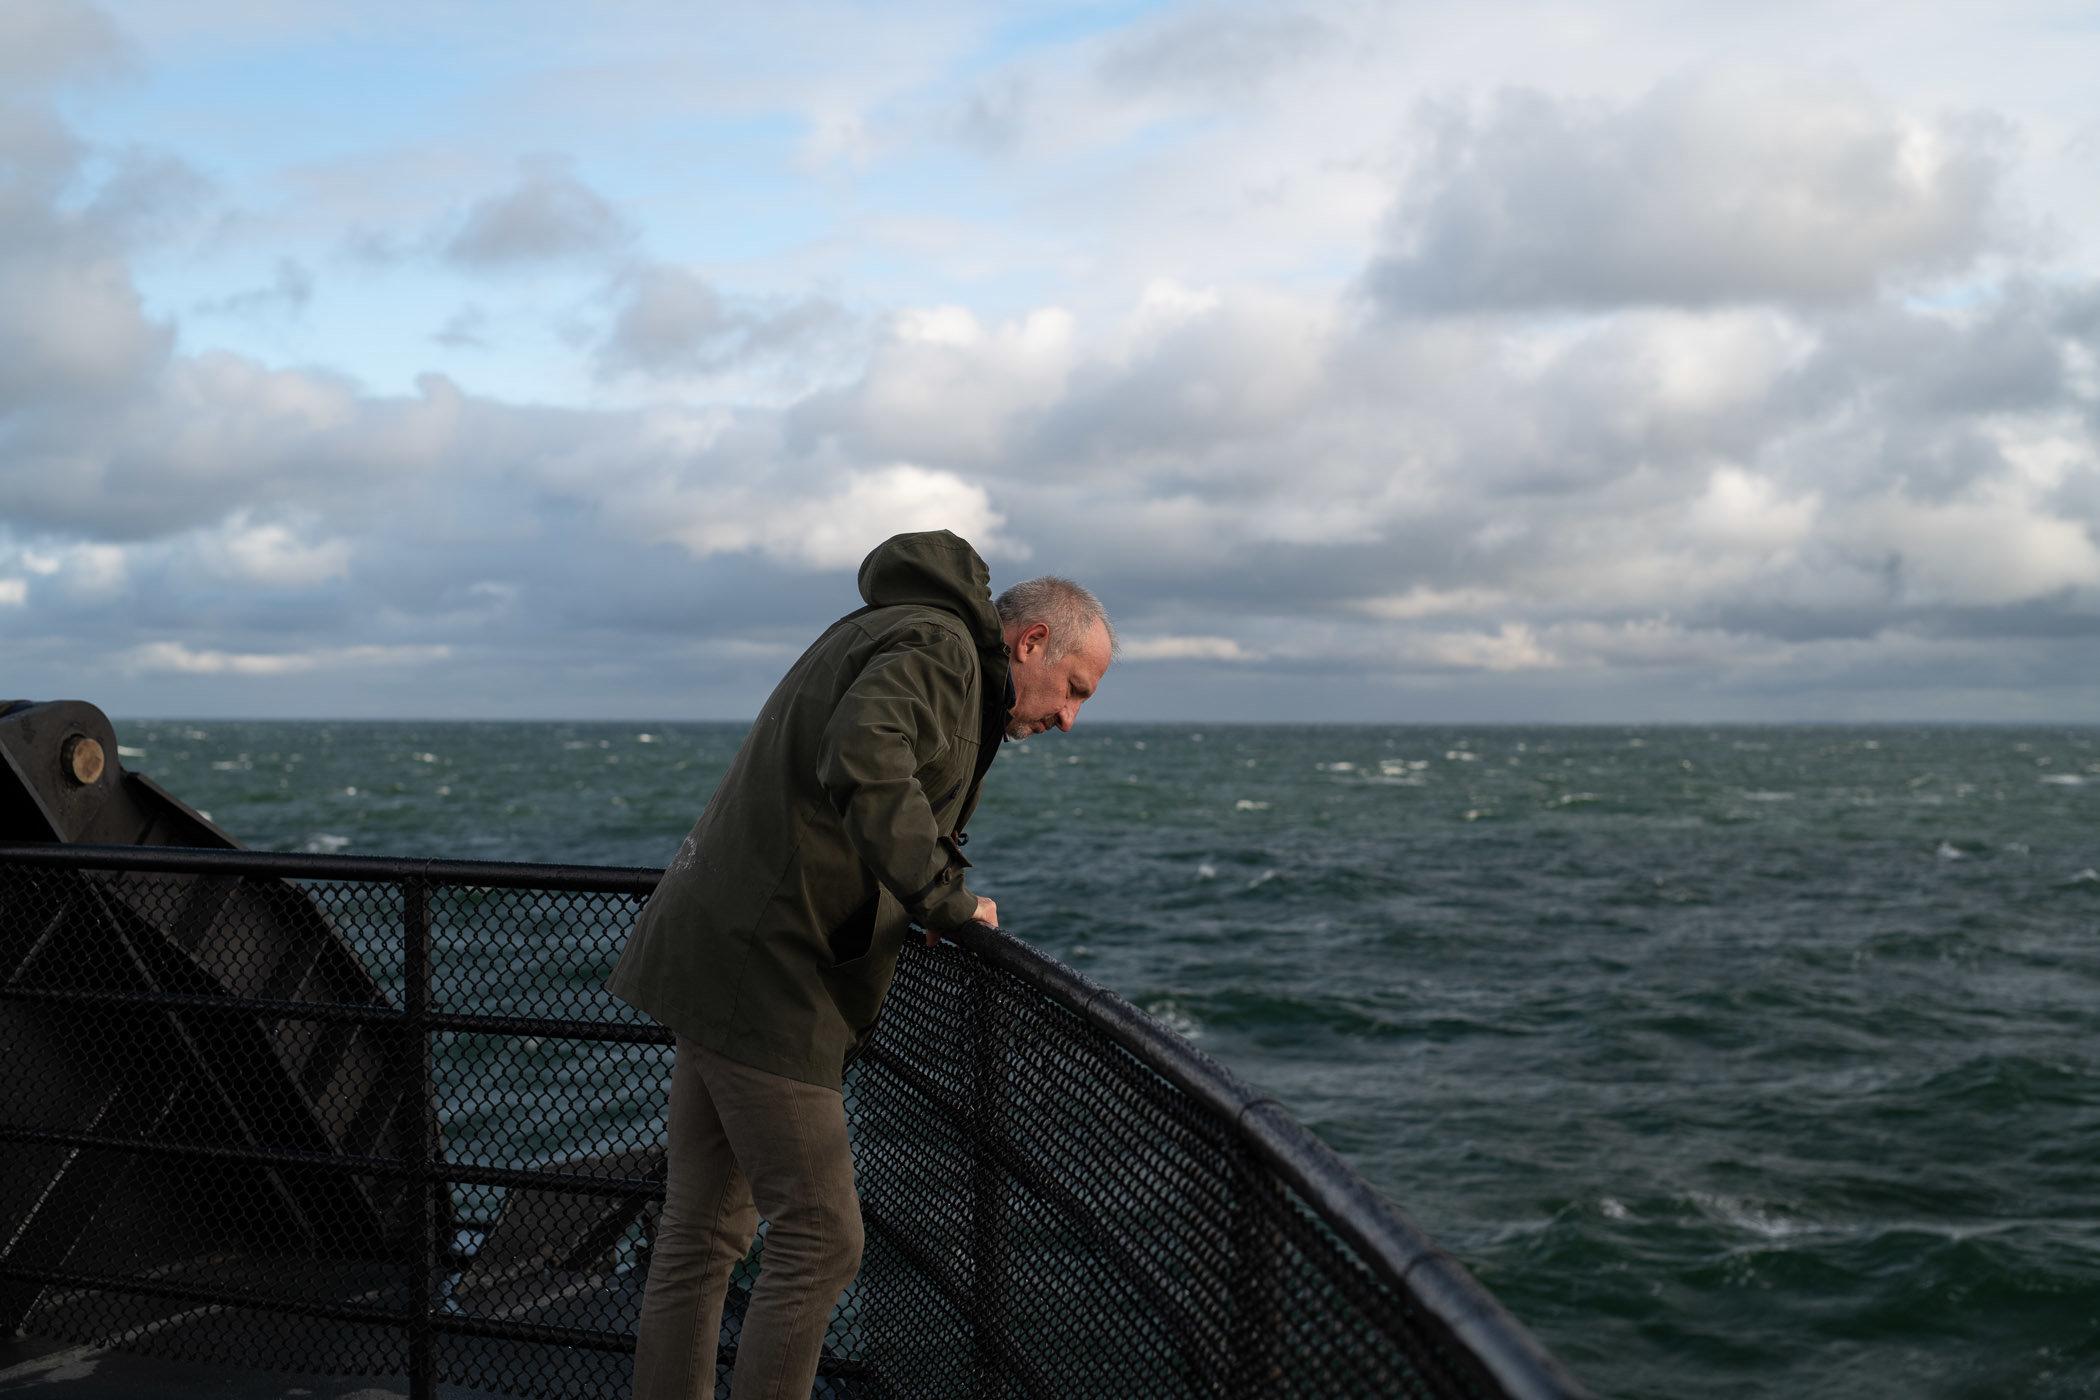 Eric-Nantucketferry.jpg